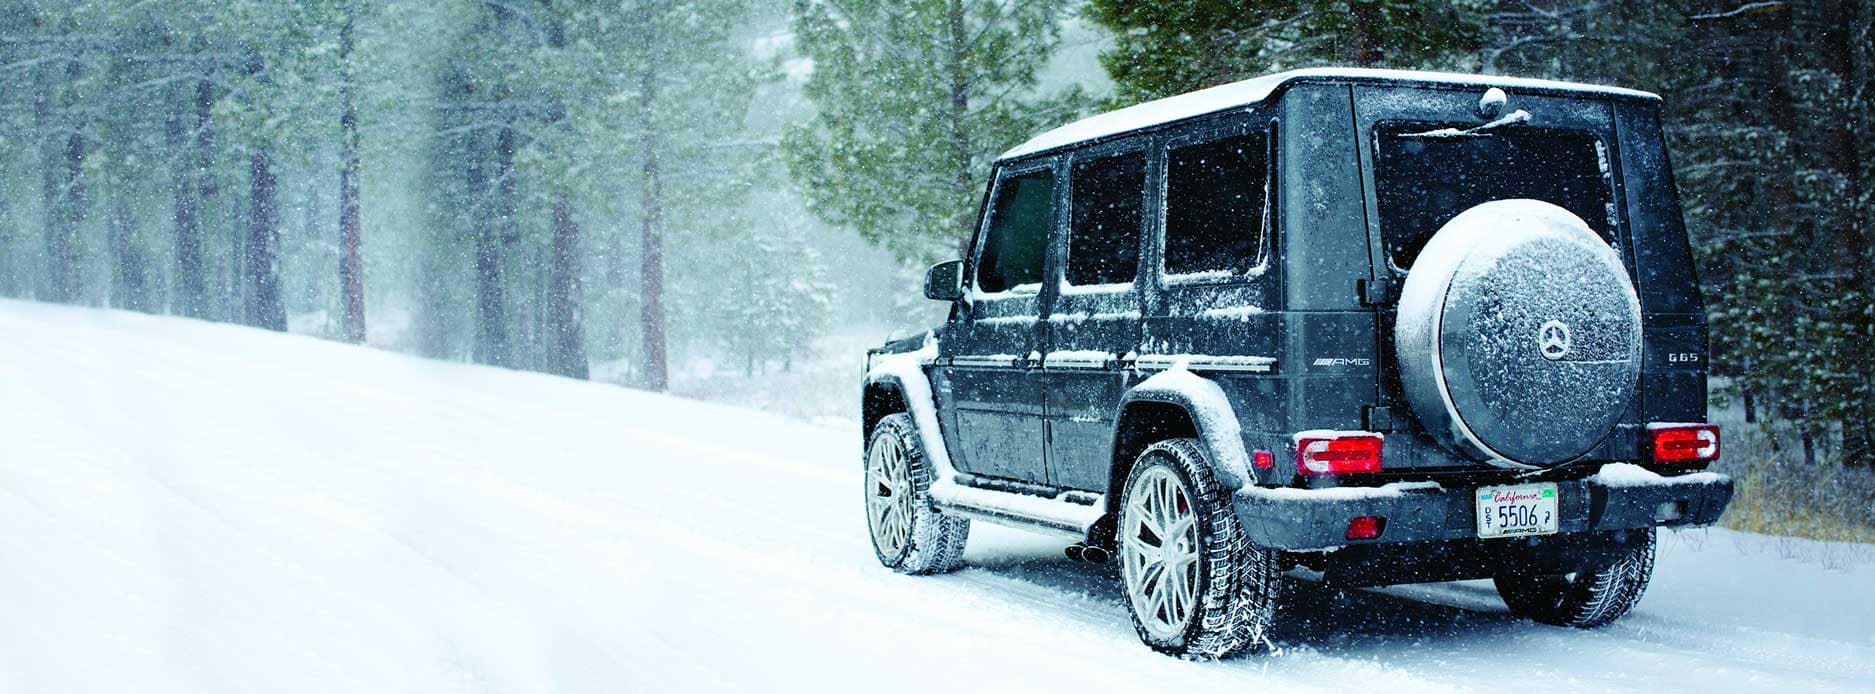 Mercedes-Benz of Des Moines | Mercedes-Benz Dealer in ...